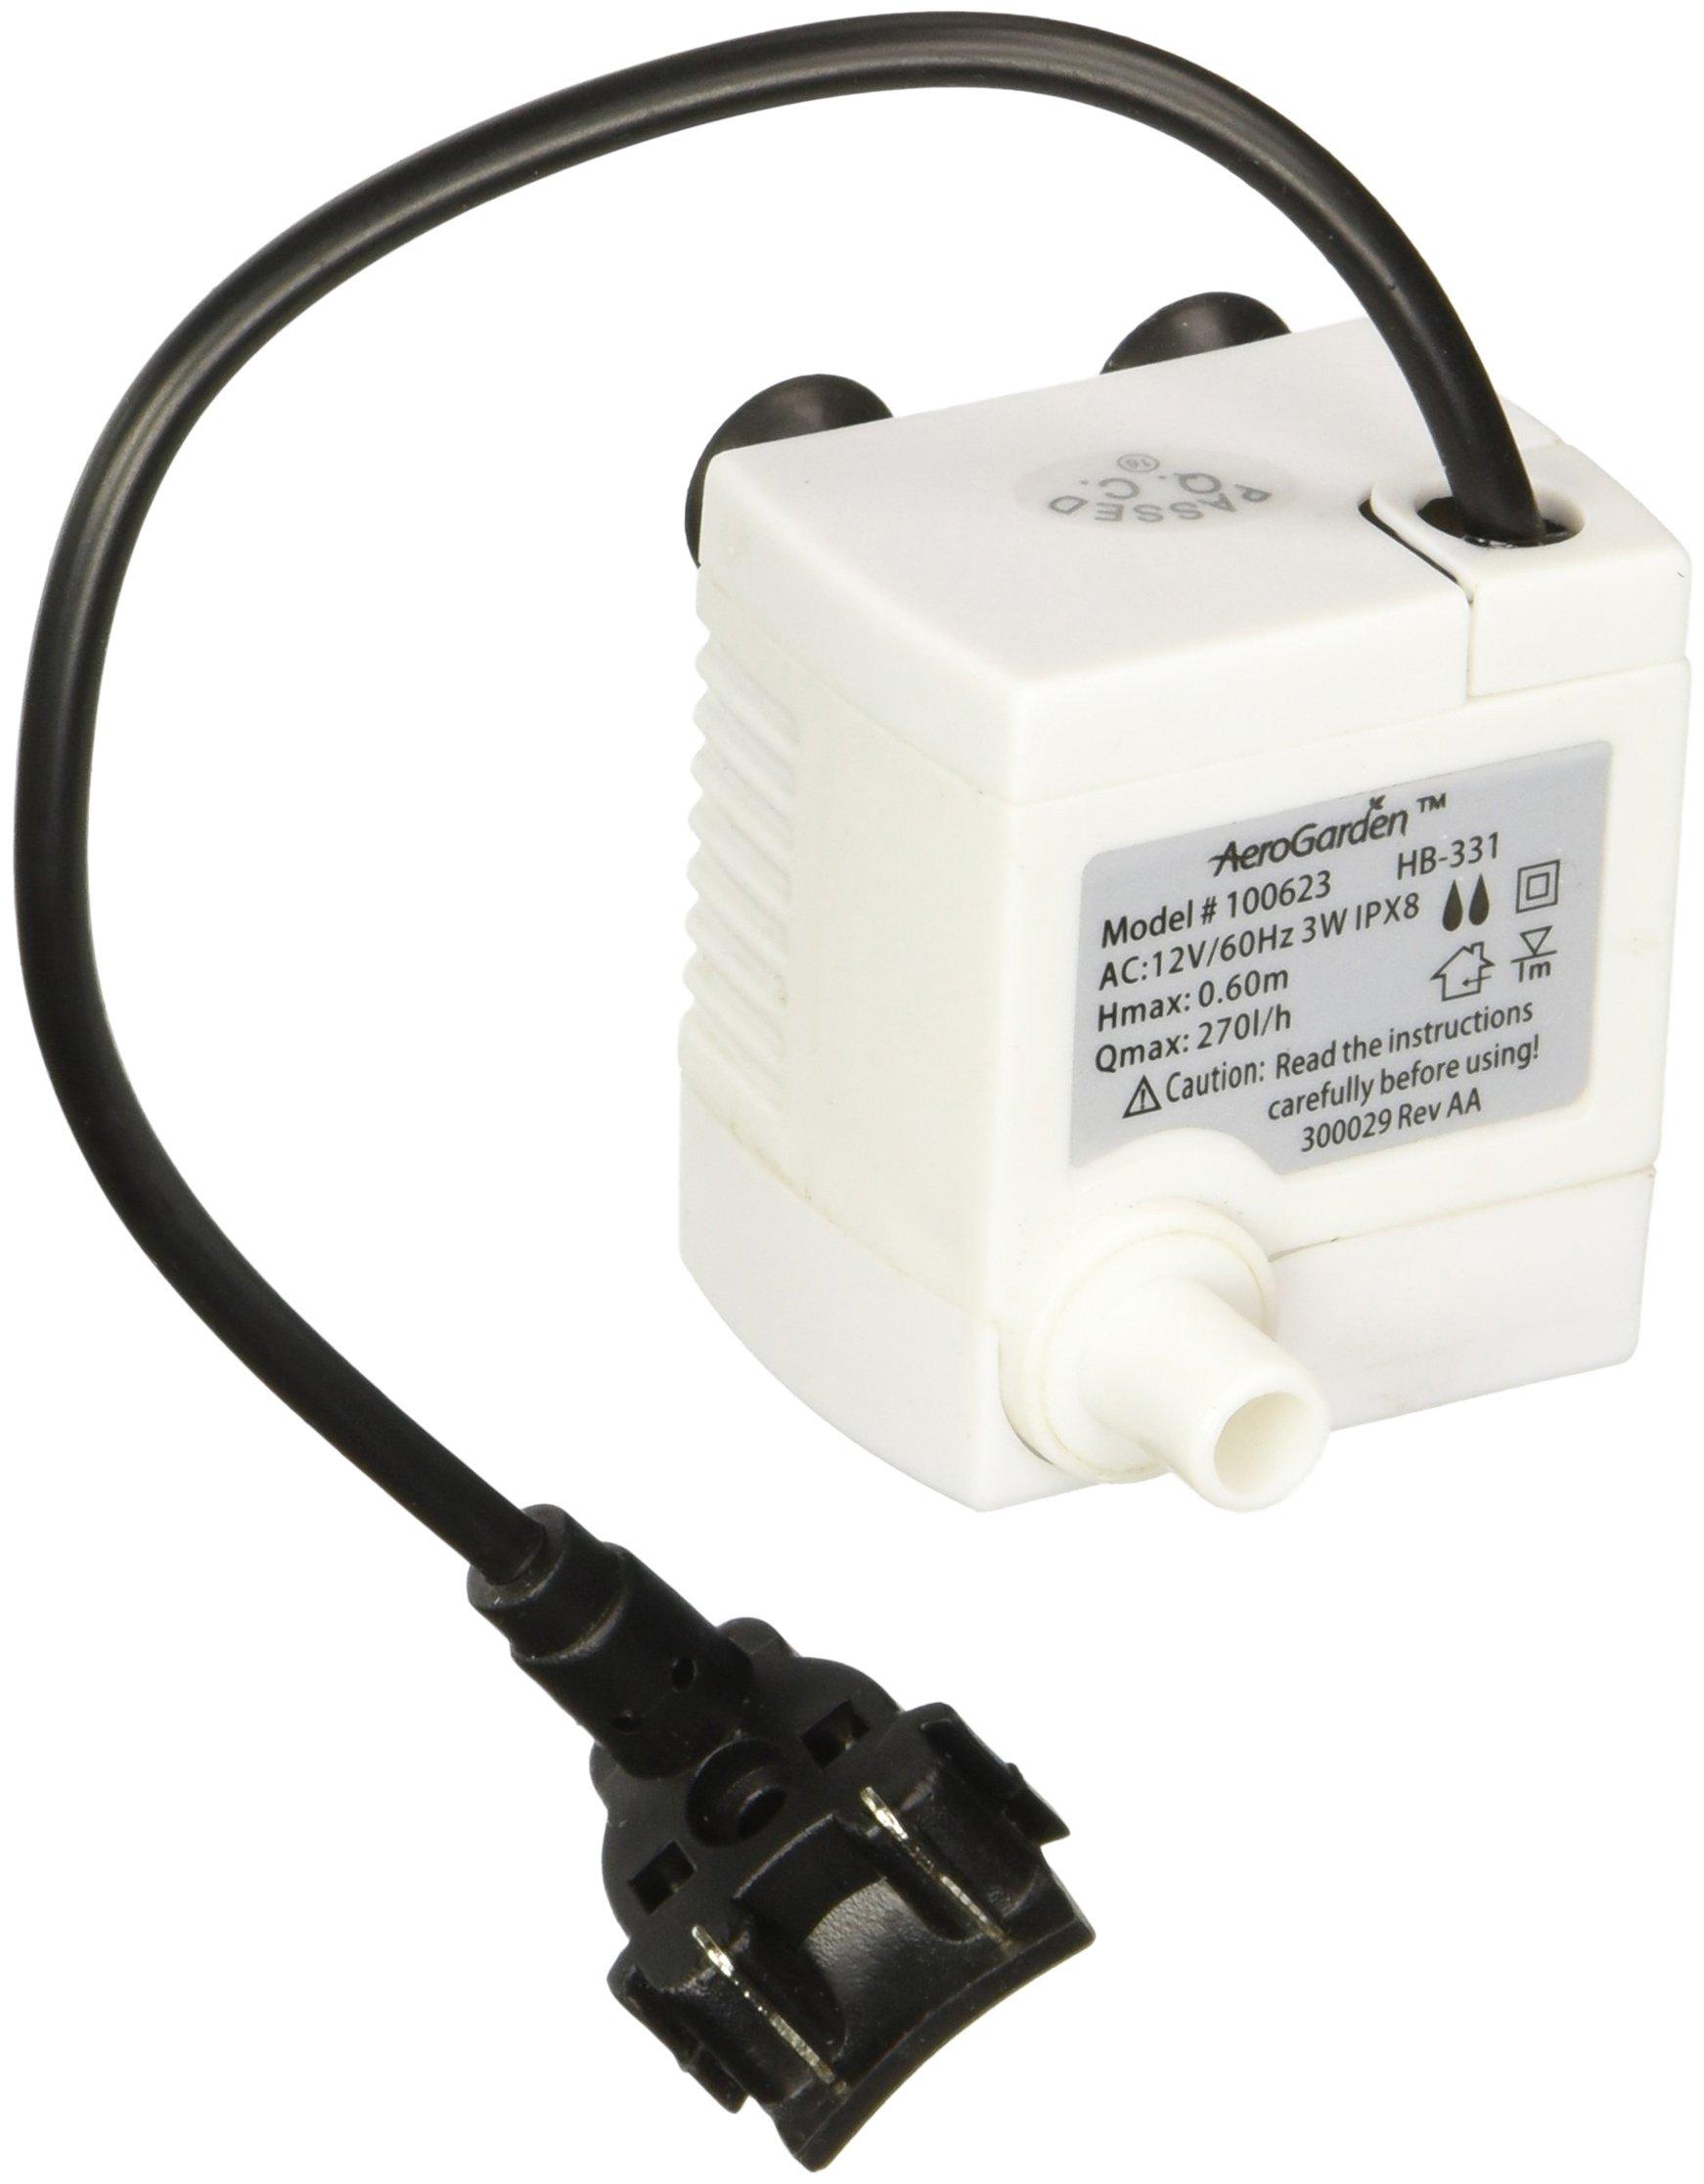 AeroGarden Replacement Pump, Model # 100623